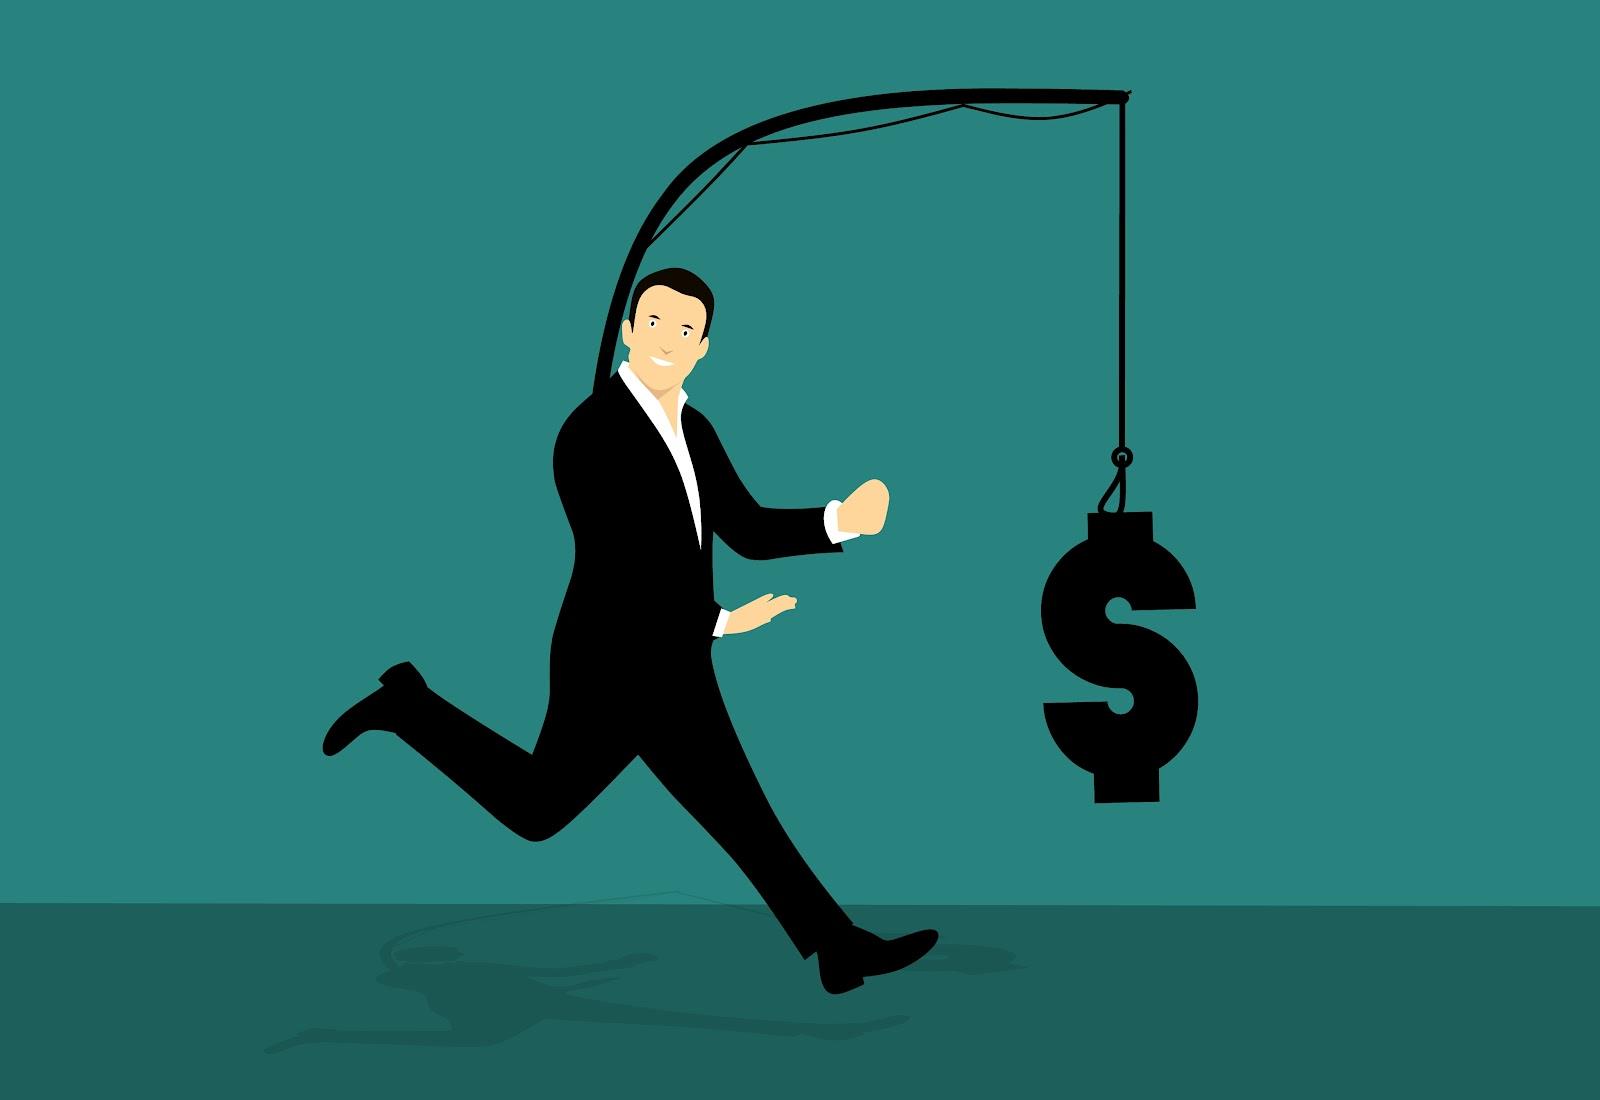 https://get.pxhere.com/photo/chasing-money-run-trying-catch-hook-finance-motivation-wealth-concept-employee-corporate-worker-businessman-dollar-cartoon-profit-commerce-salary-trap-benefit-bait-line-recreation-silhouette-font-illustration-art-1453161.jpg